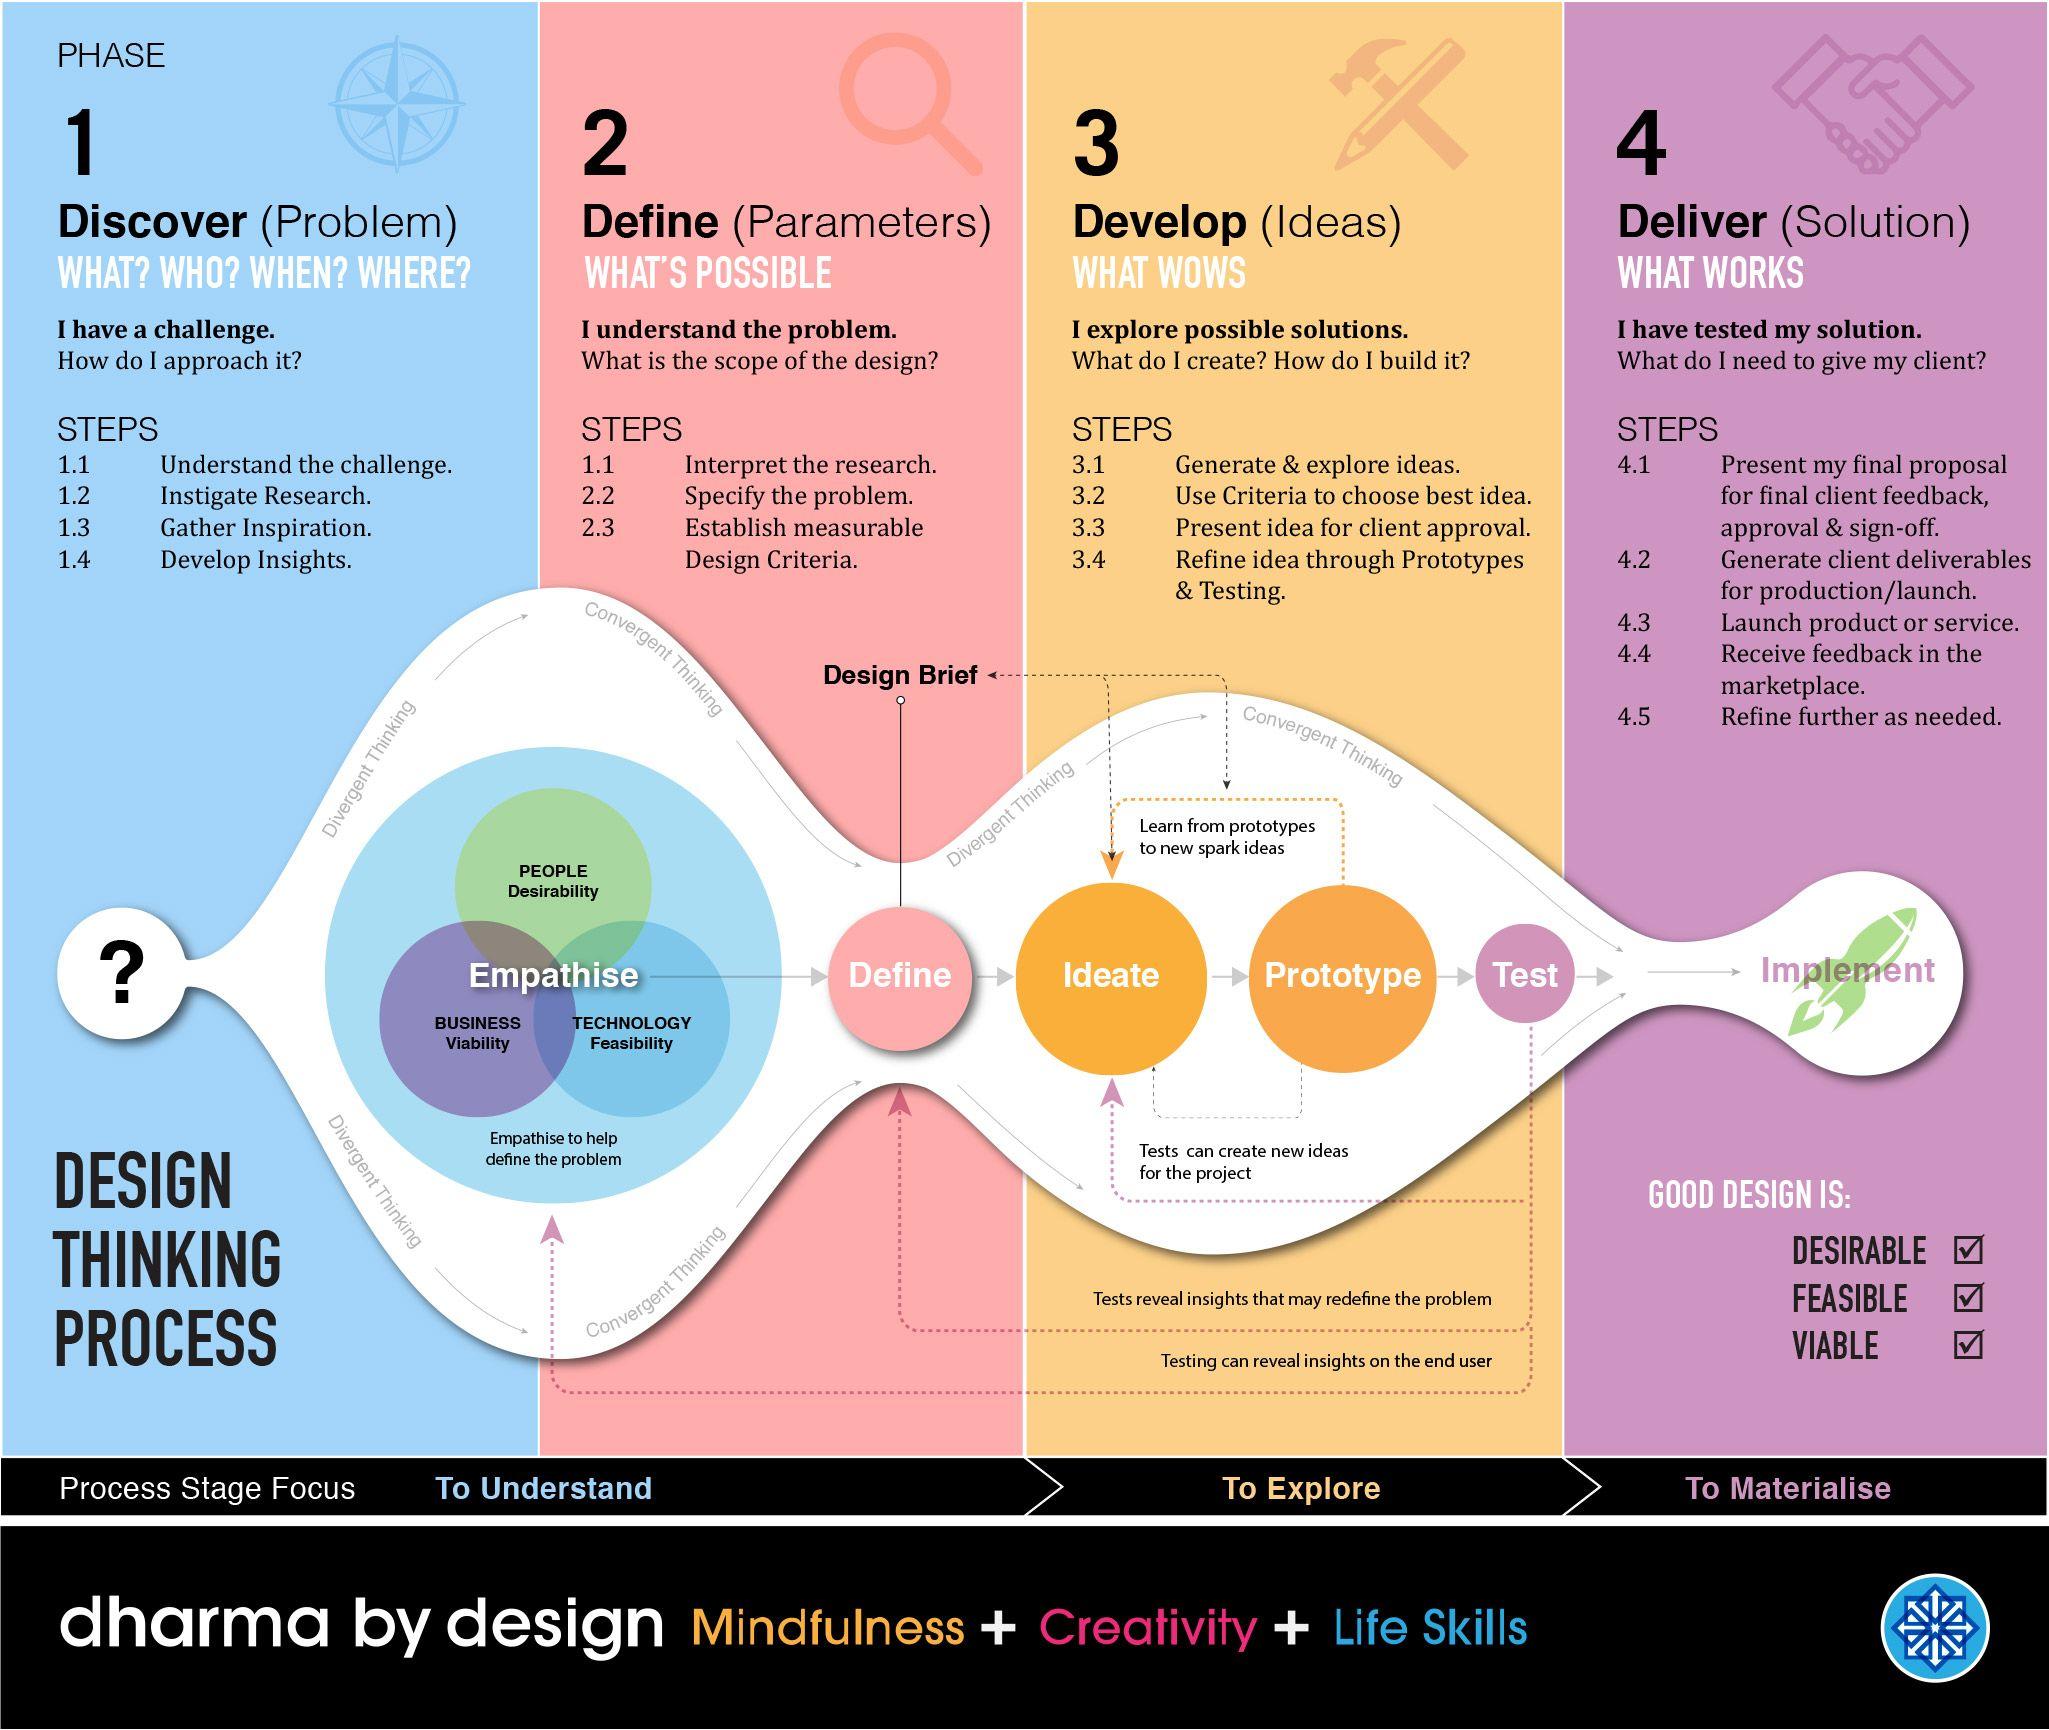 The Design Thinking Process | Design thinking process, Design thinking,  Design